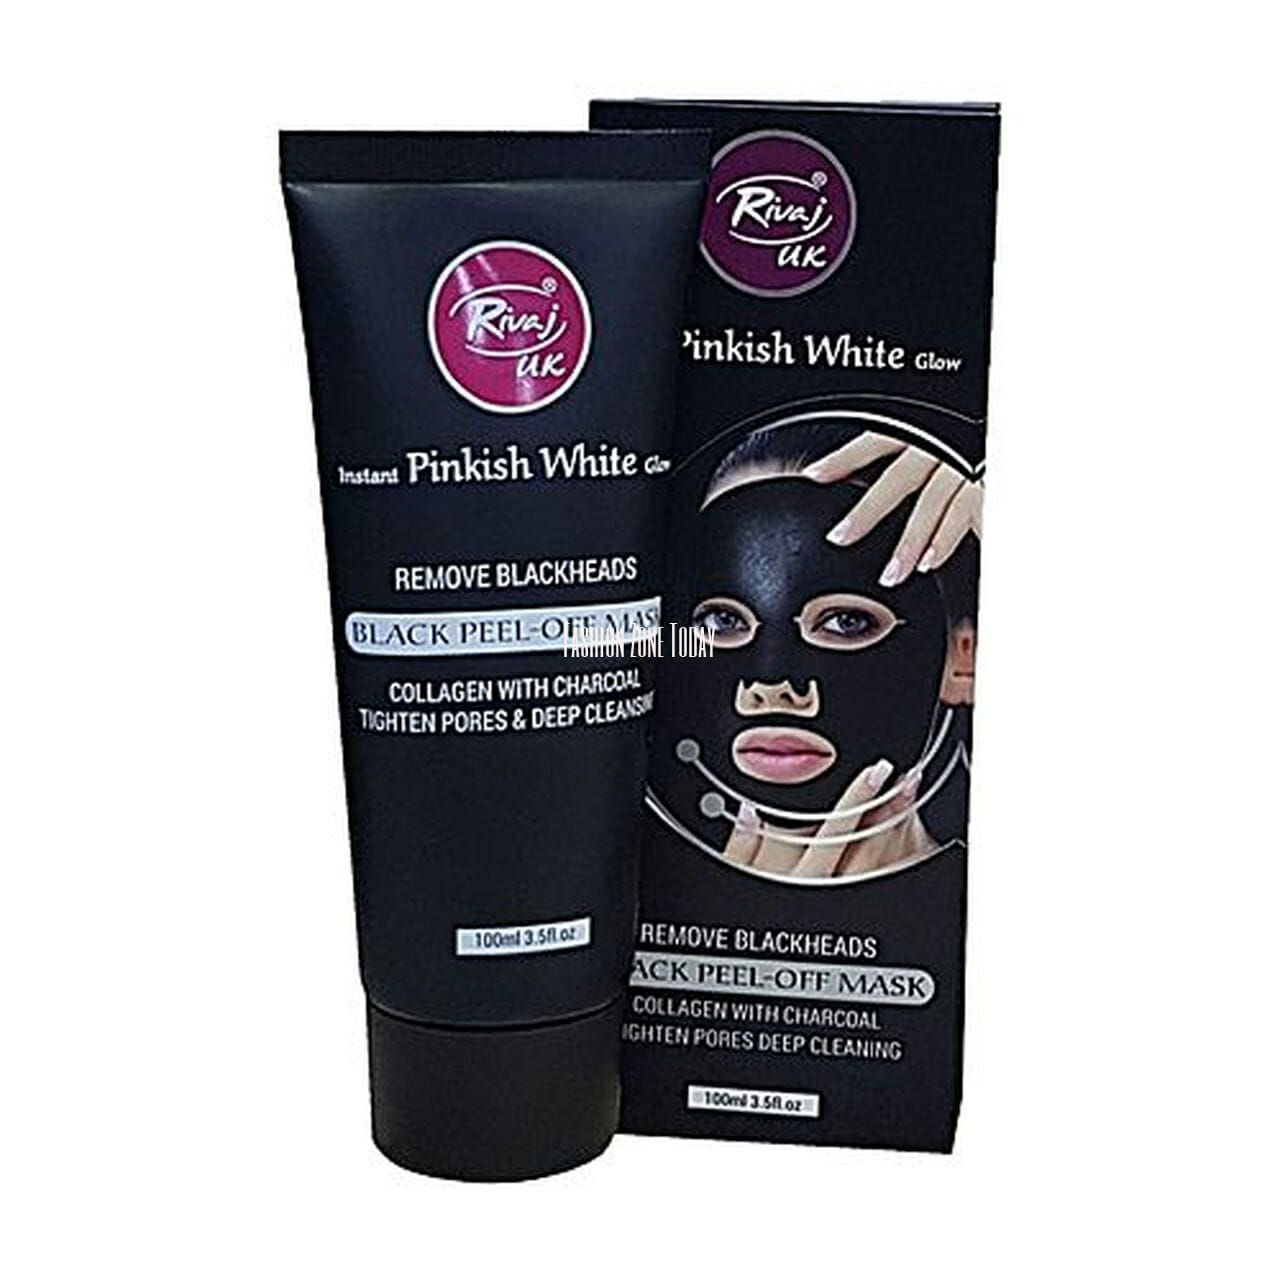 Rivaj UK Charcoal Pinkish White Peel Off Mask 100ml Best Charcoal Face Mask in Pakistan